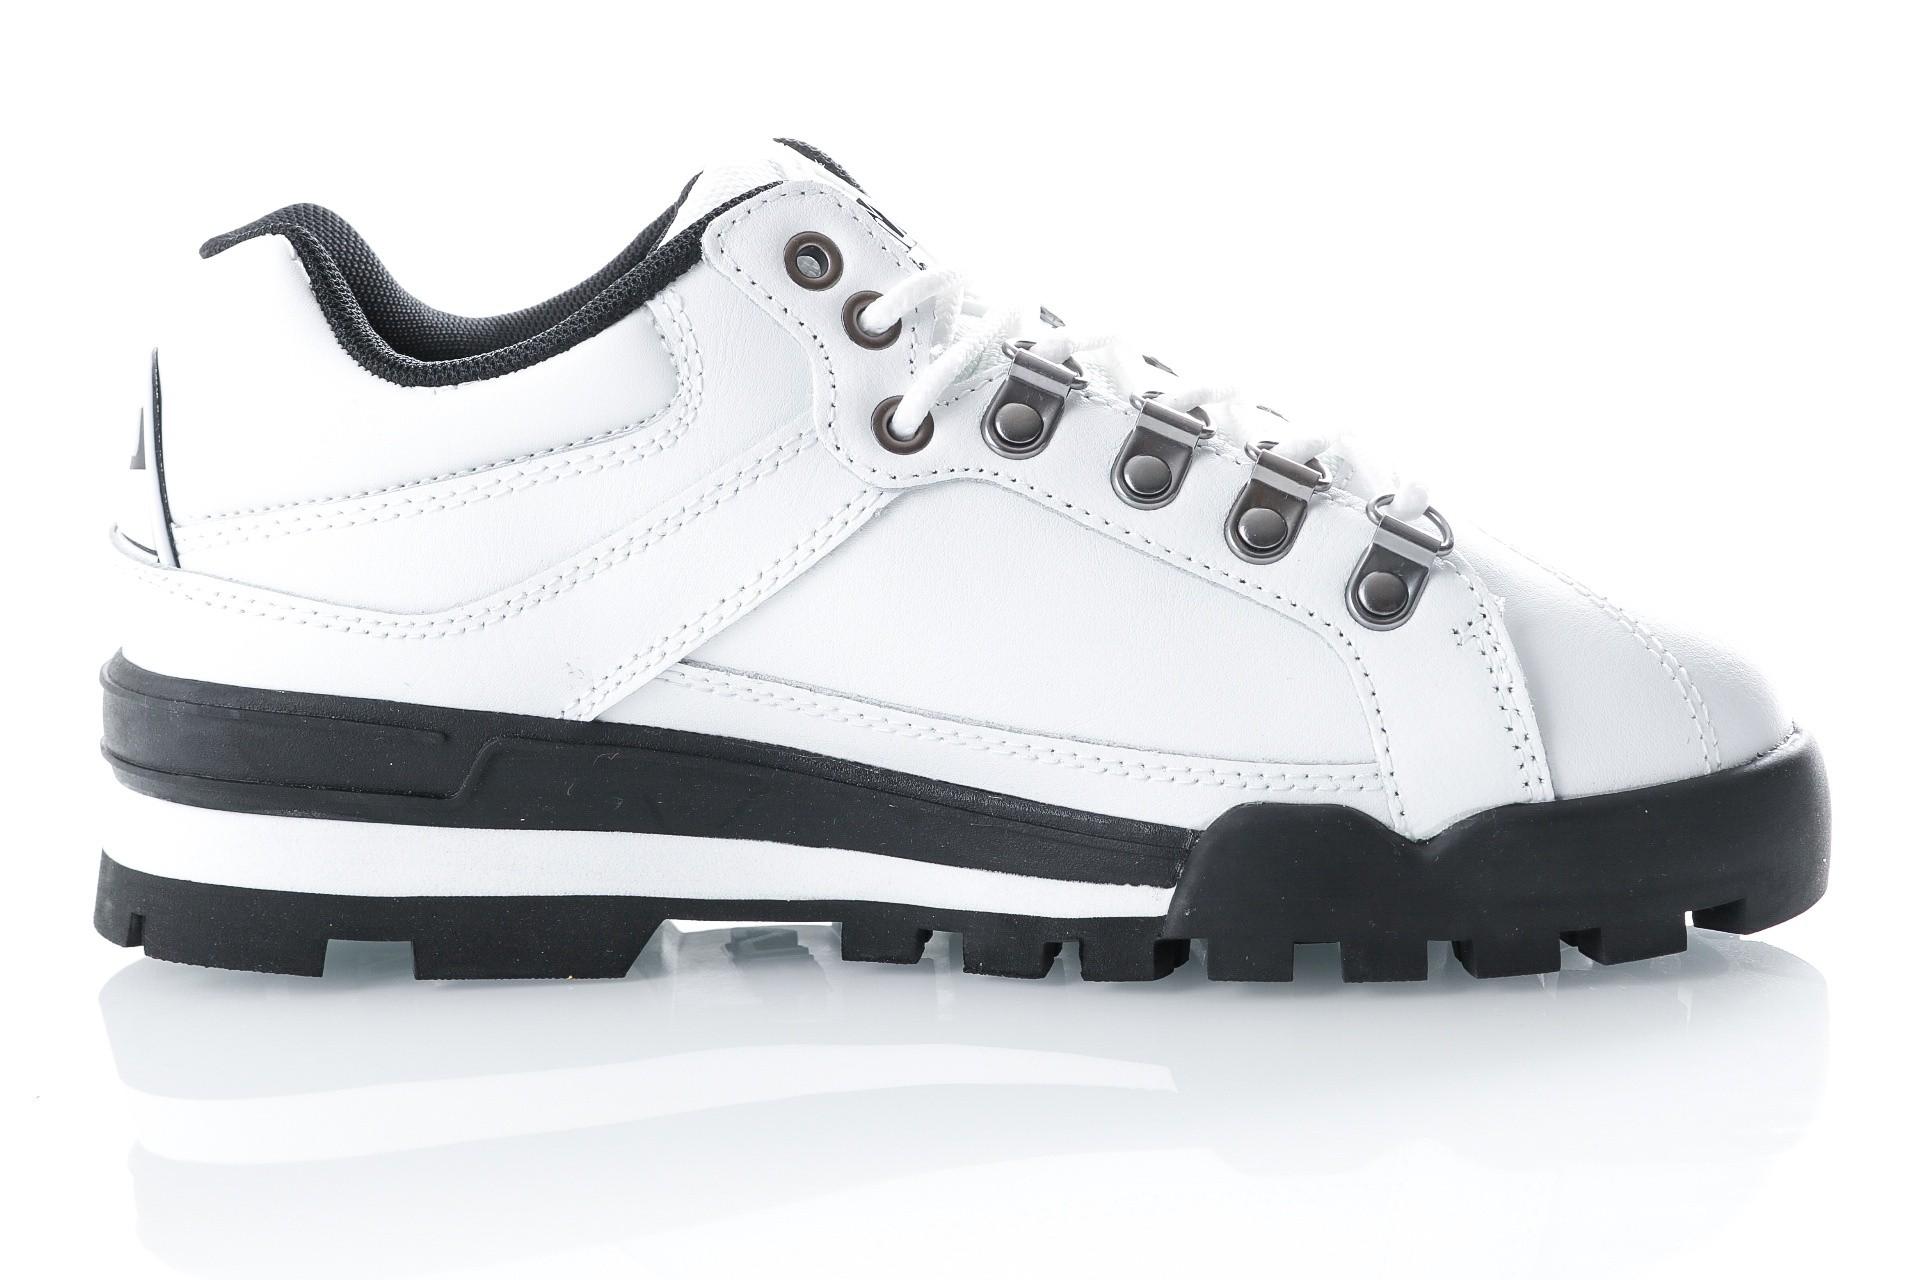 Afbeelding van Fila Trailblazer L wmn 1010482 Sneakers white